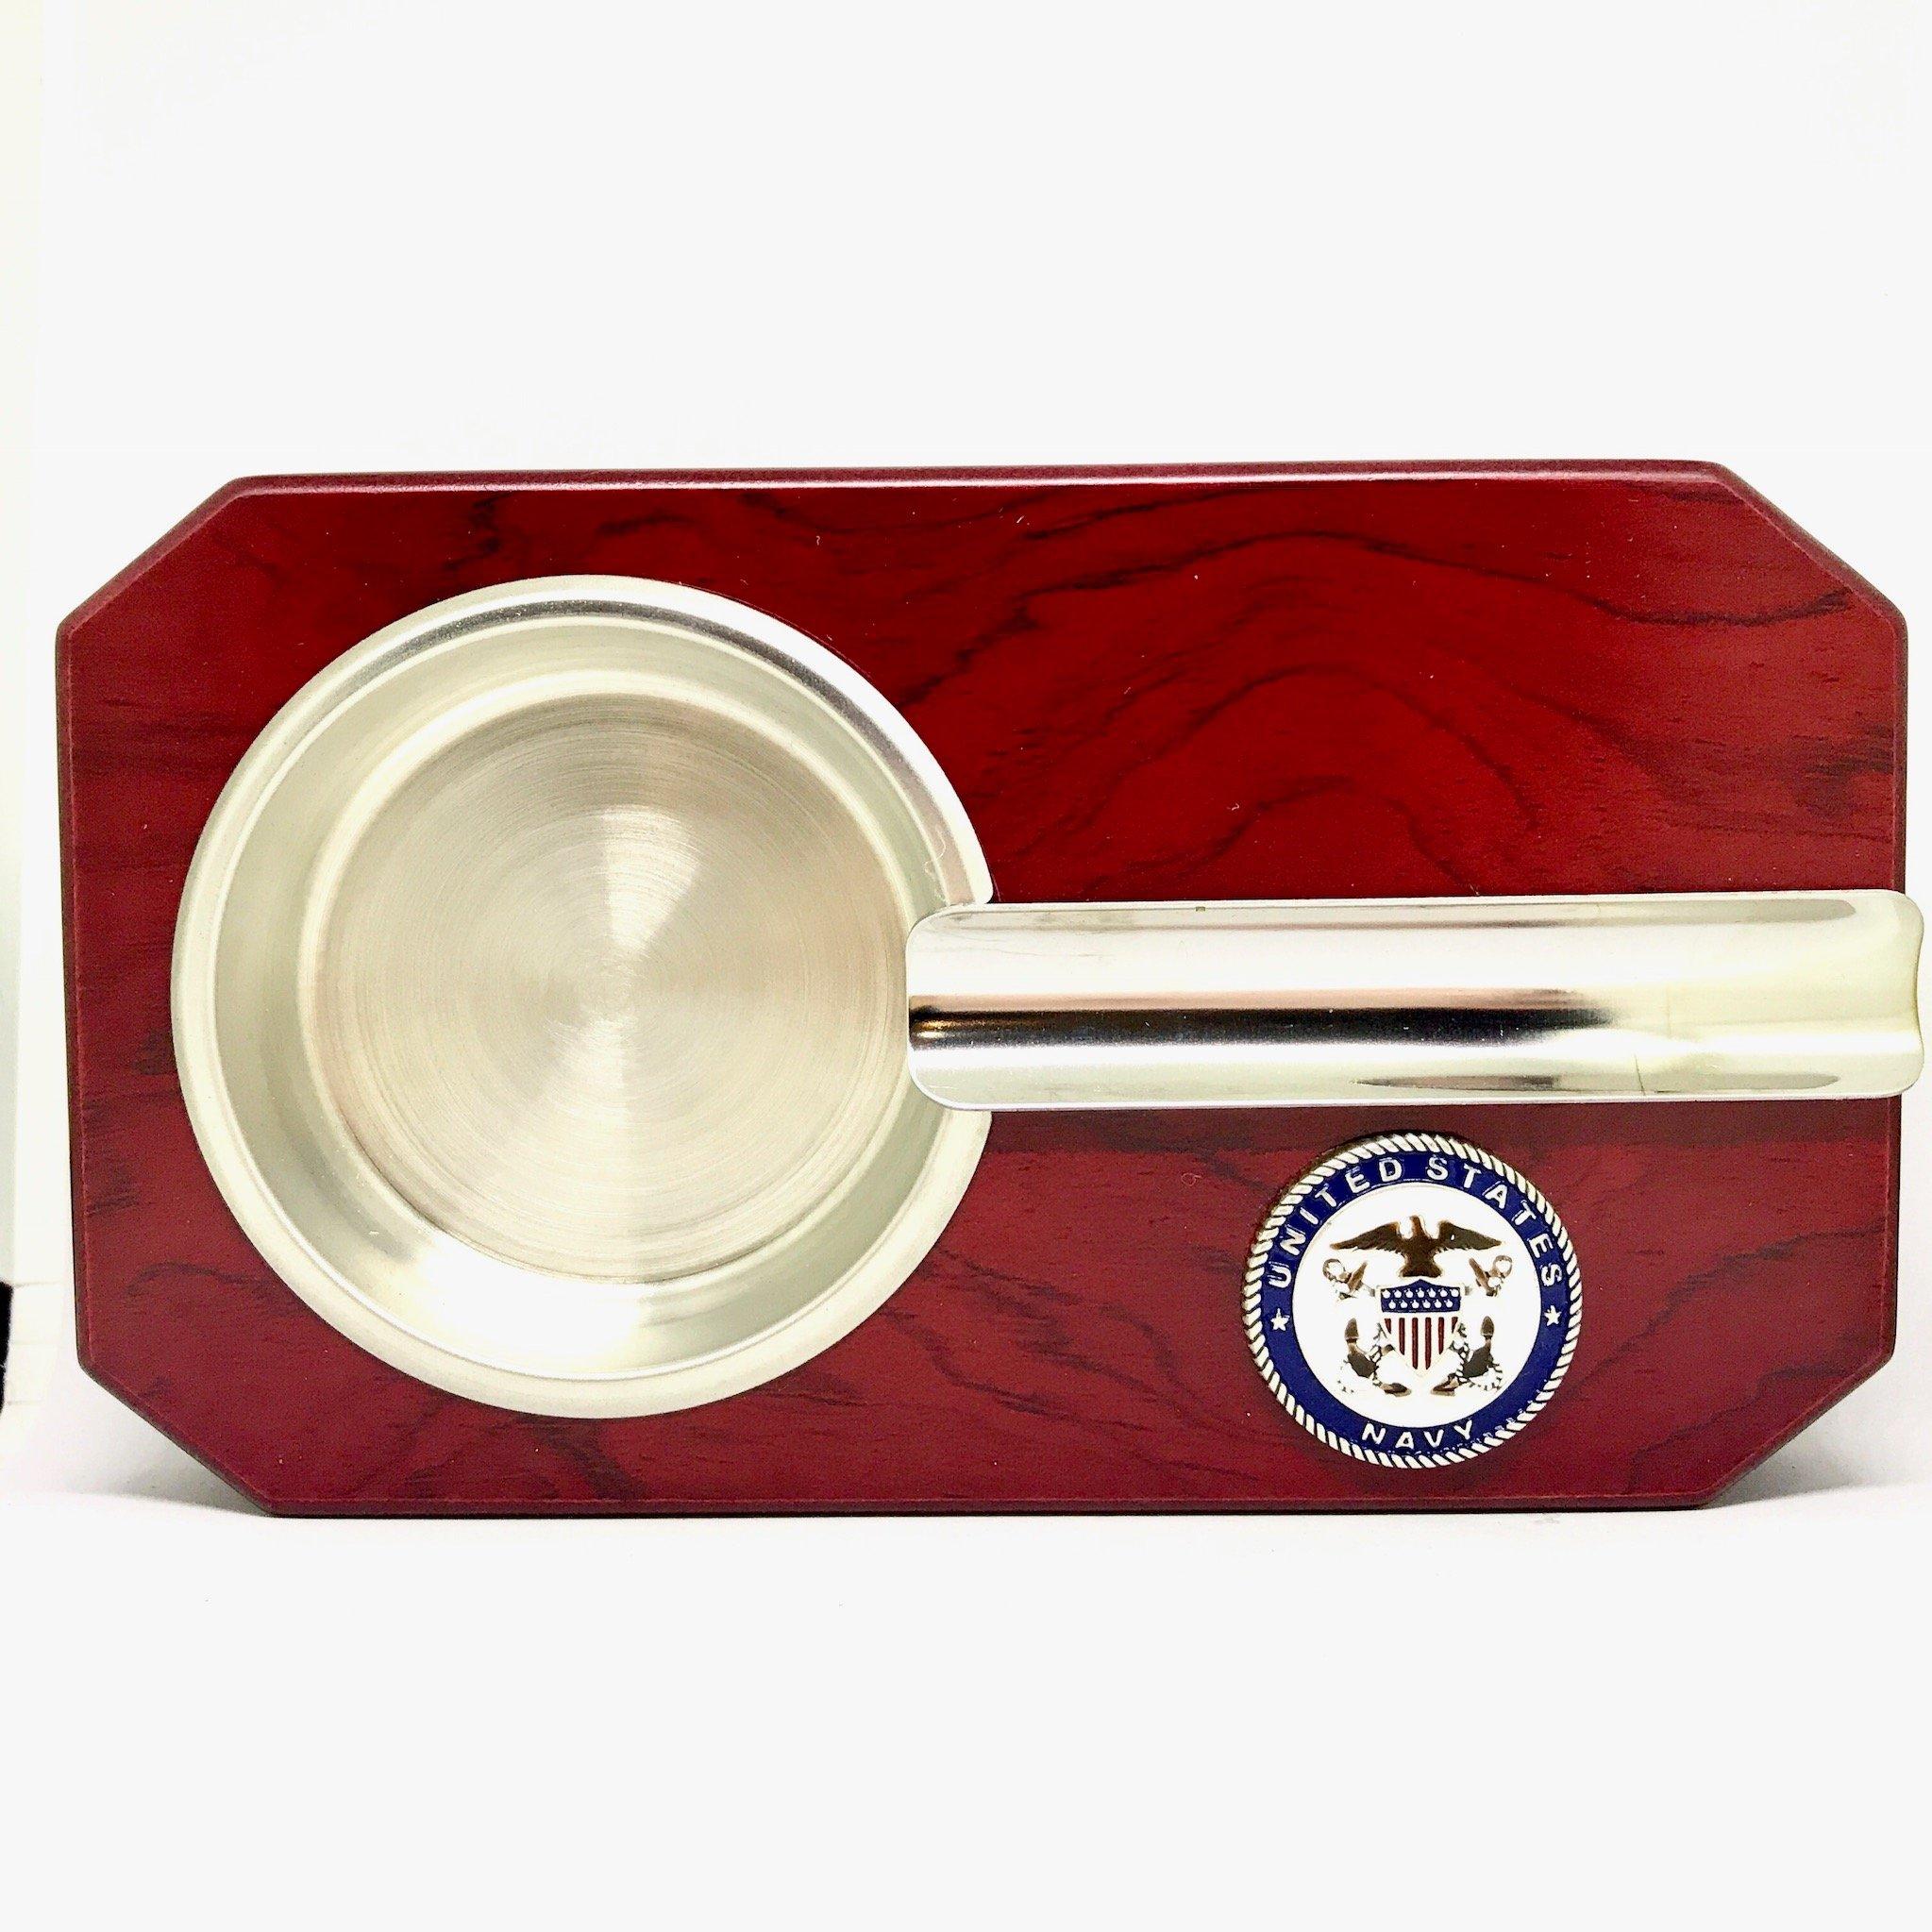 US Navy Cigar Ashtray - Military Cigar Accessories